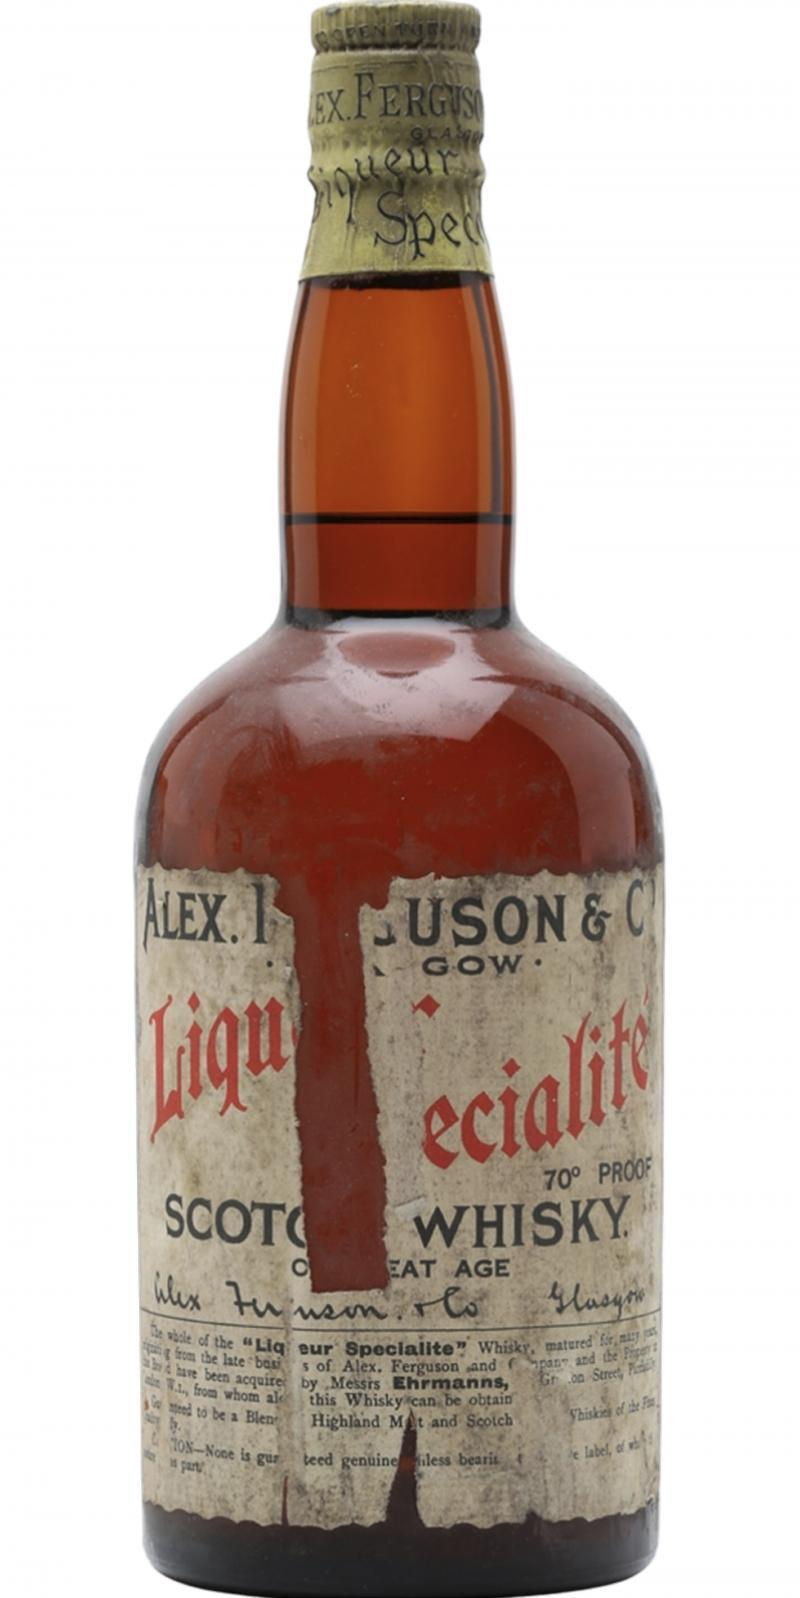 Alex Ferguson & Co. Scotch Whisky